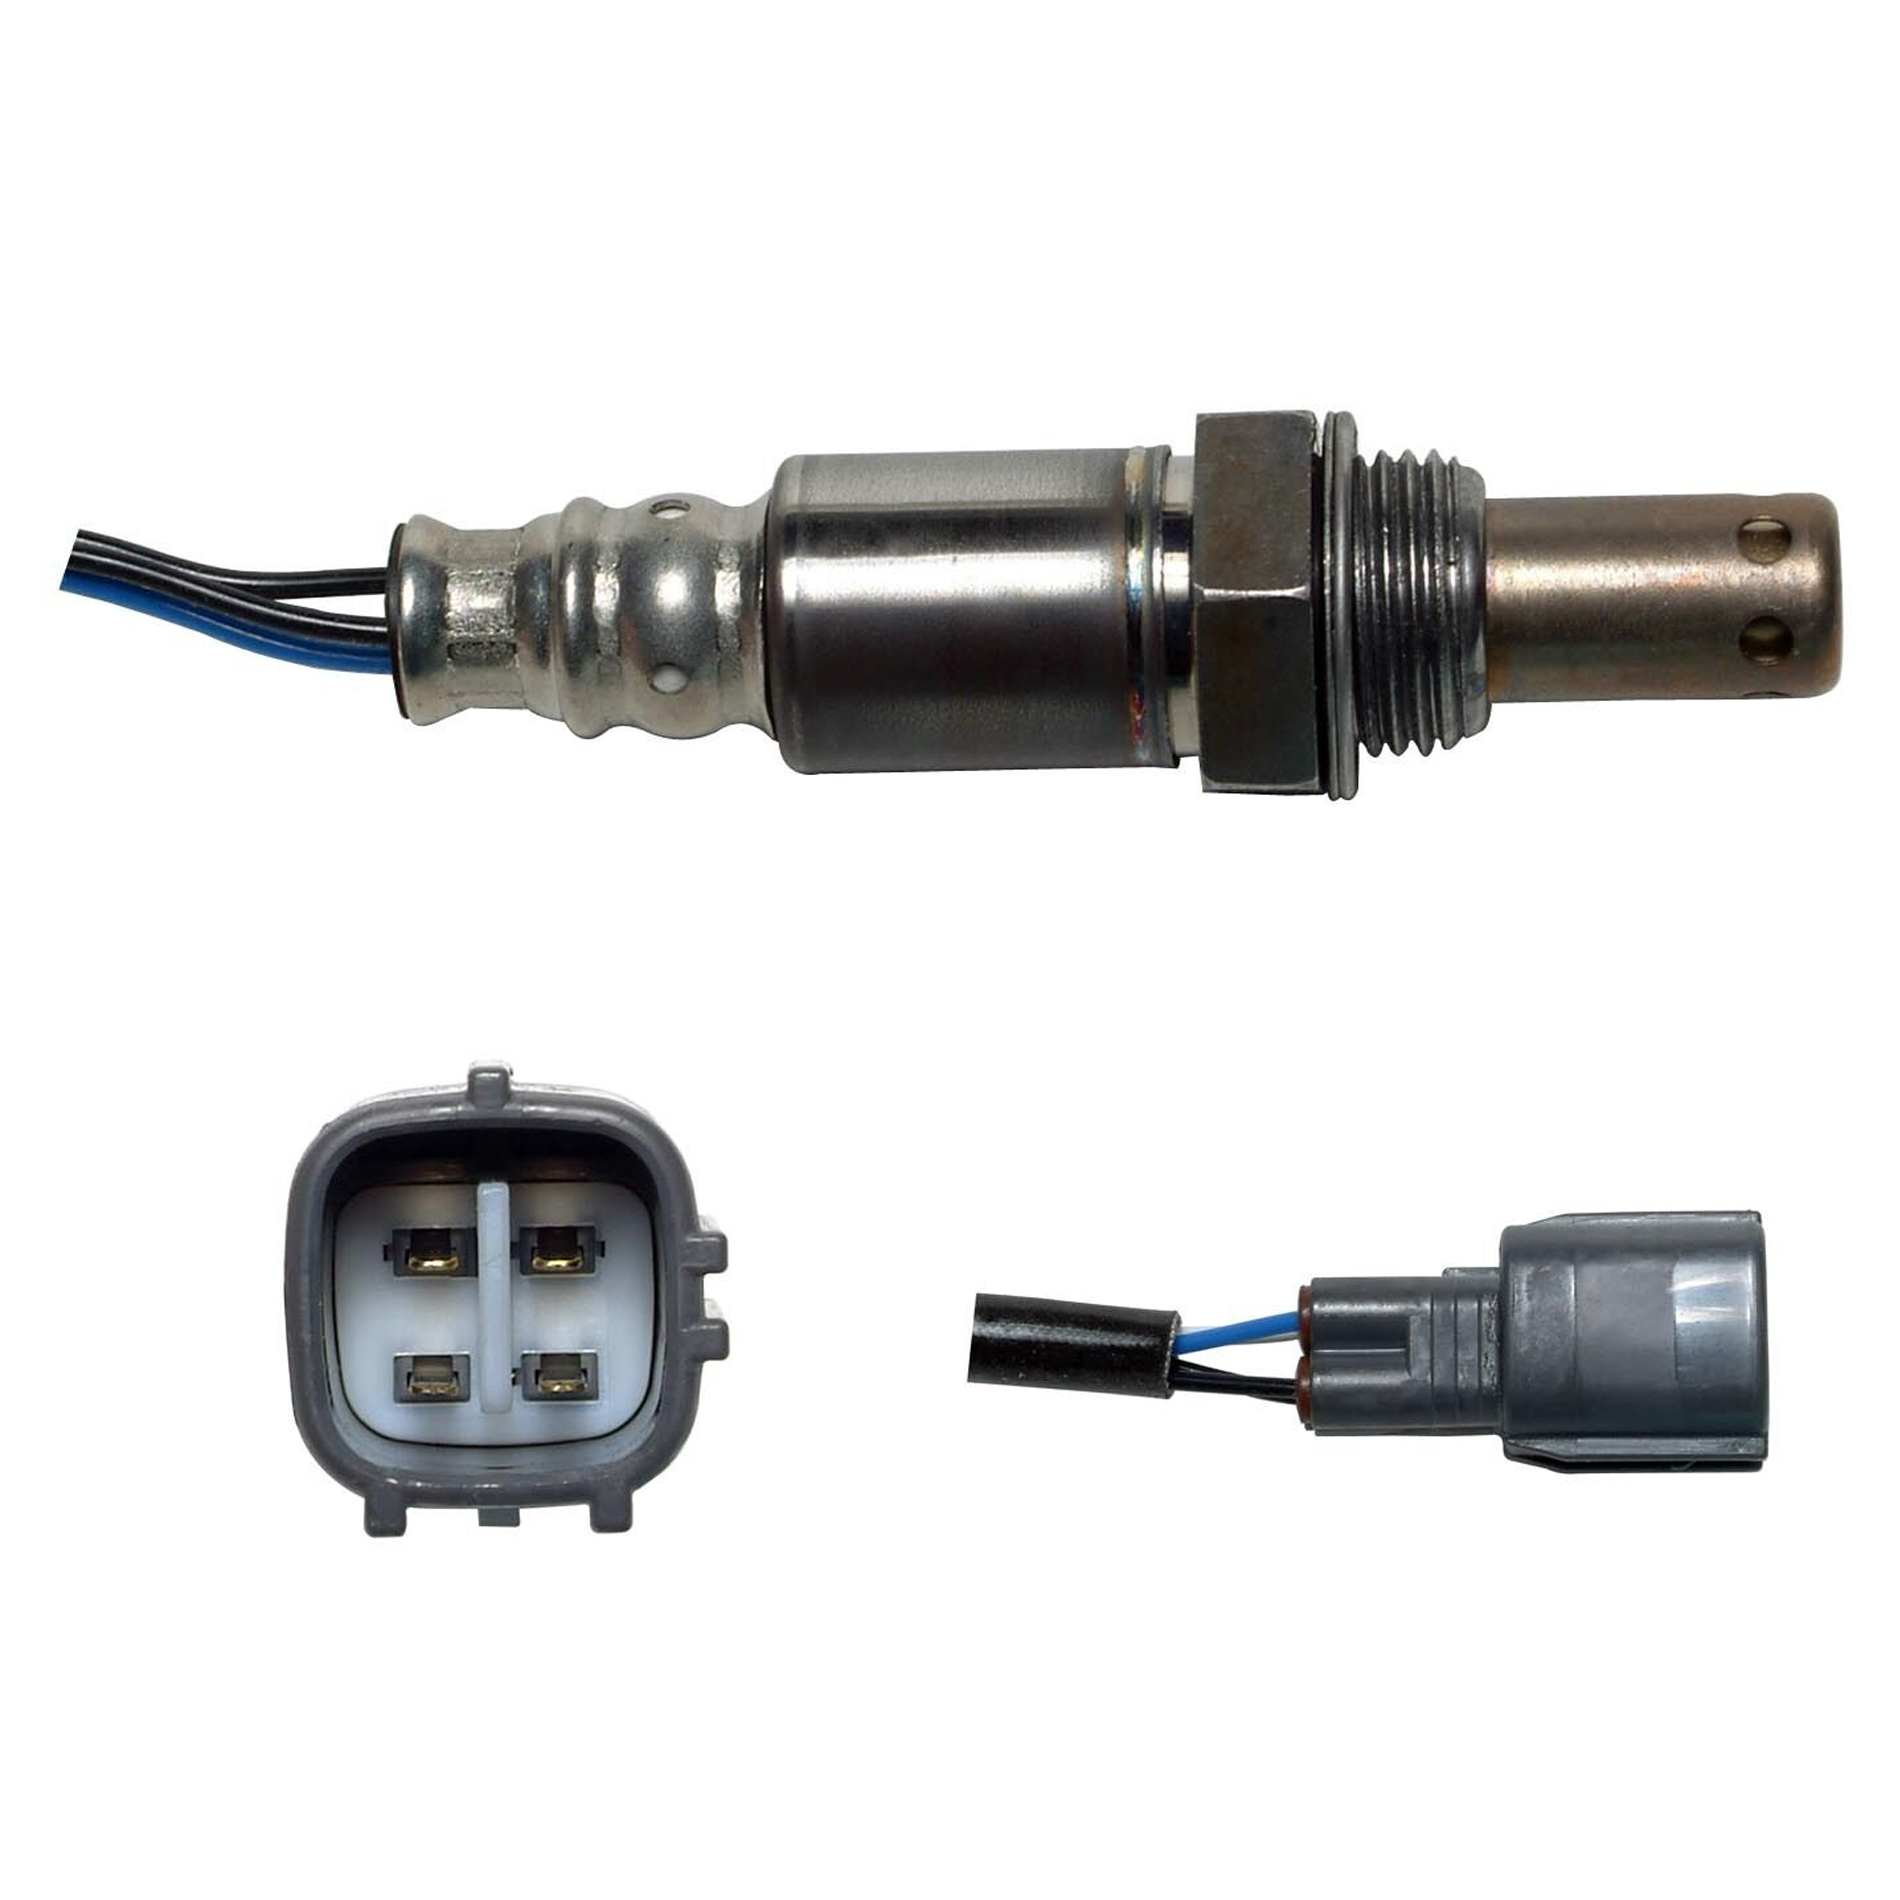 234-9041 15093 O2 Oxygen Sensor Upstream for Lexus Rx350 Toyota Camry Highlander RAV4 Solara Avalon Scion TC XB Fit 213-2846 234-9044 15960 13997 15582 8946748050 8946748060 8946733080//TAMKKEN